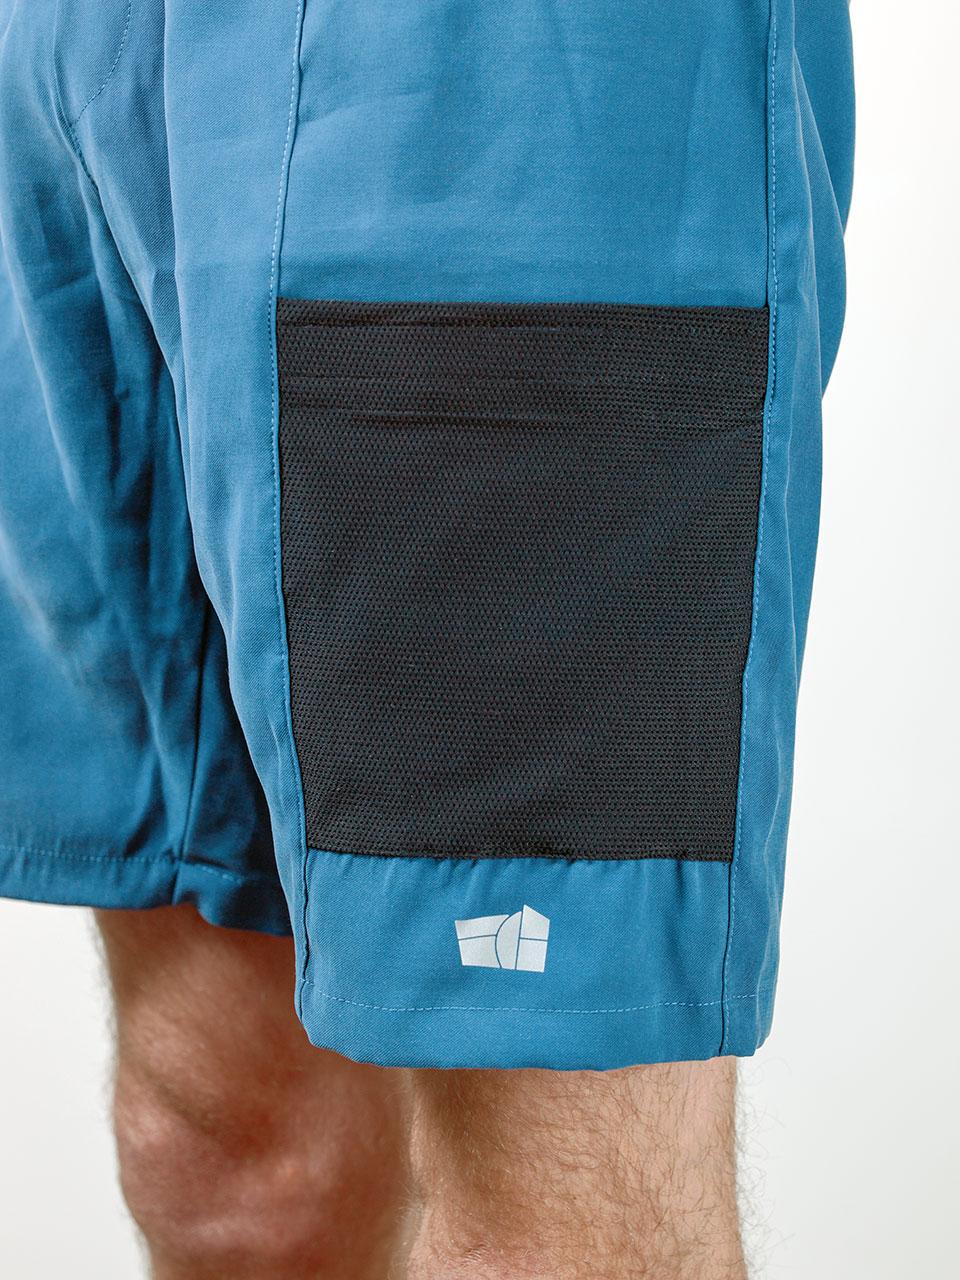 ÉCH Apparel – Ignis shorts chalk insert for climbing